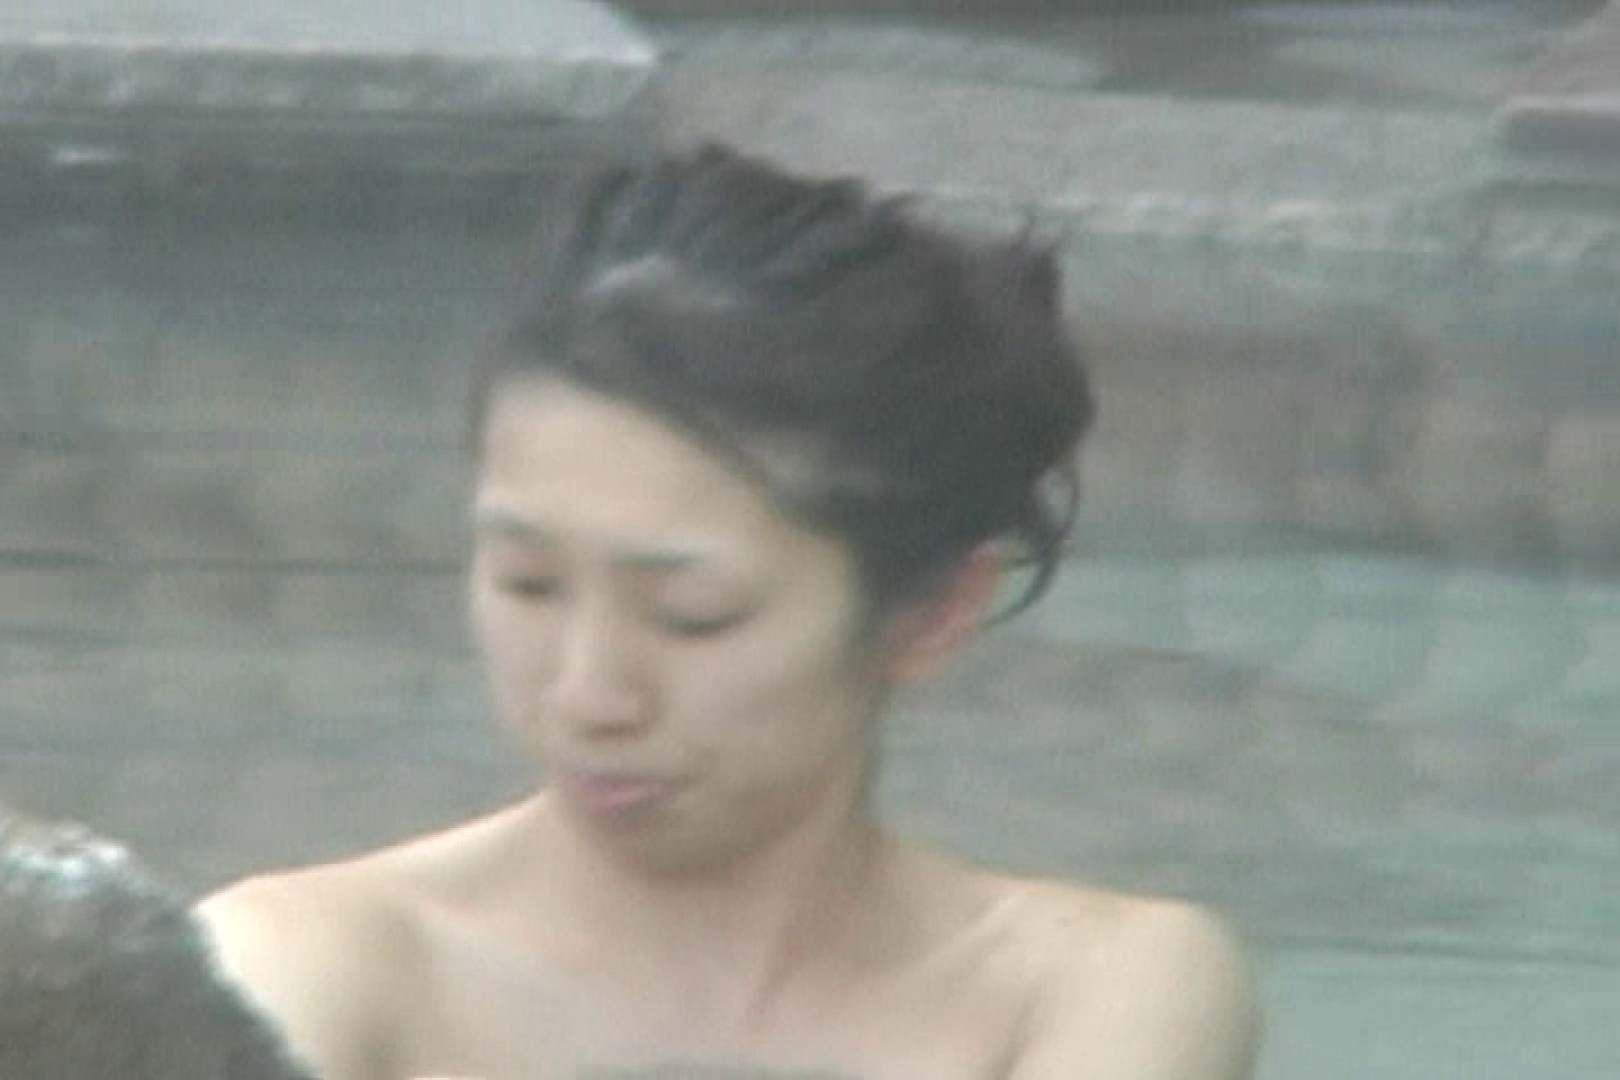 Aquaな露天風呂Vol.588 HなOL | 盗撮  66pic 22